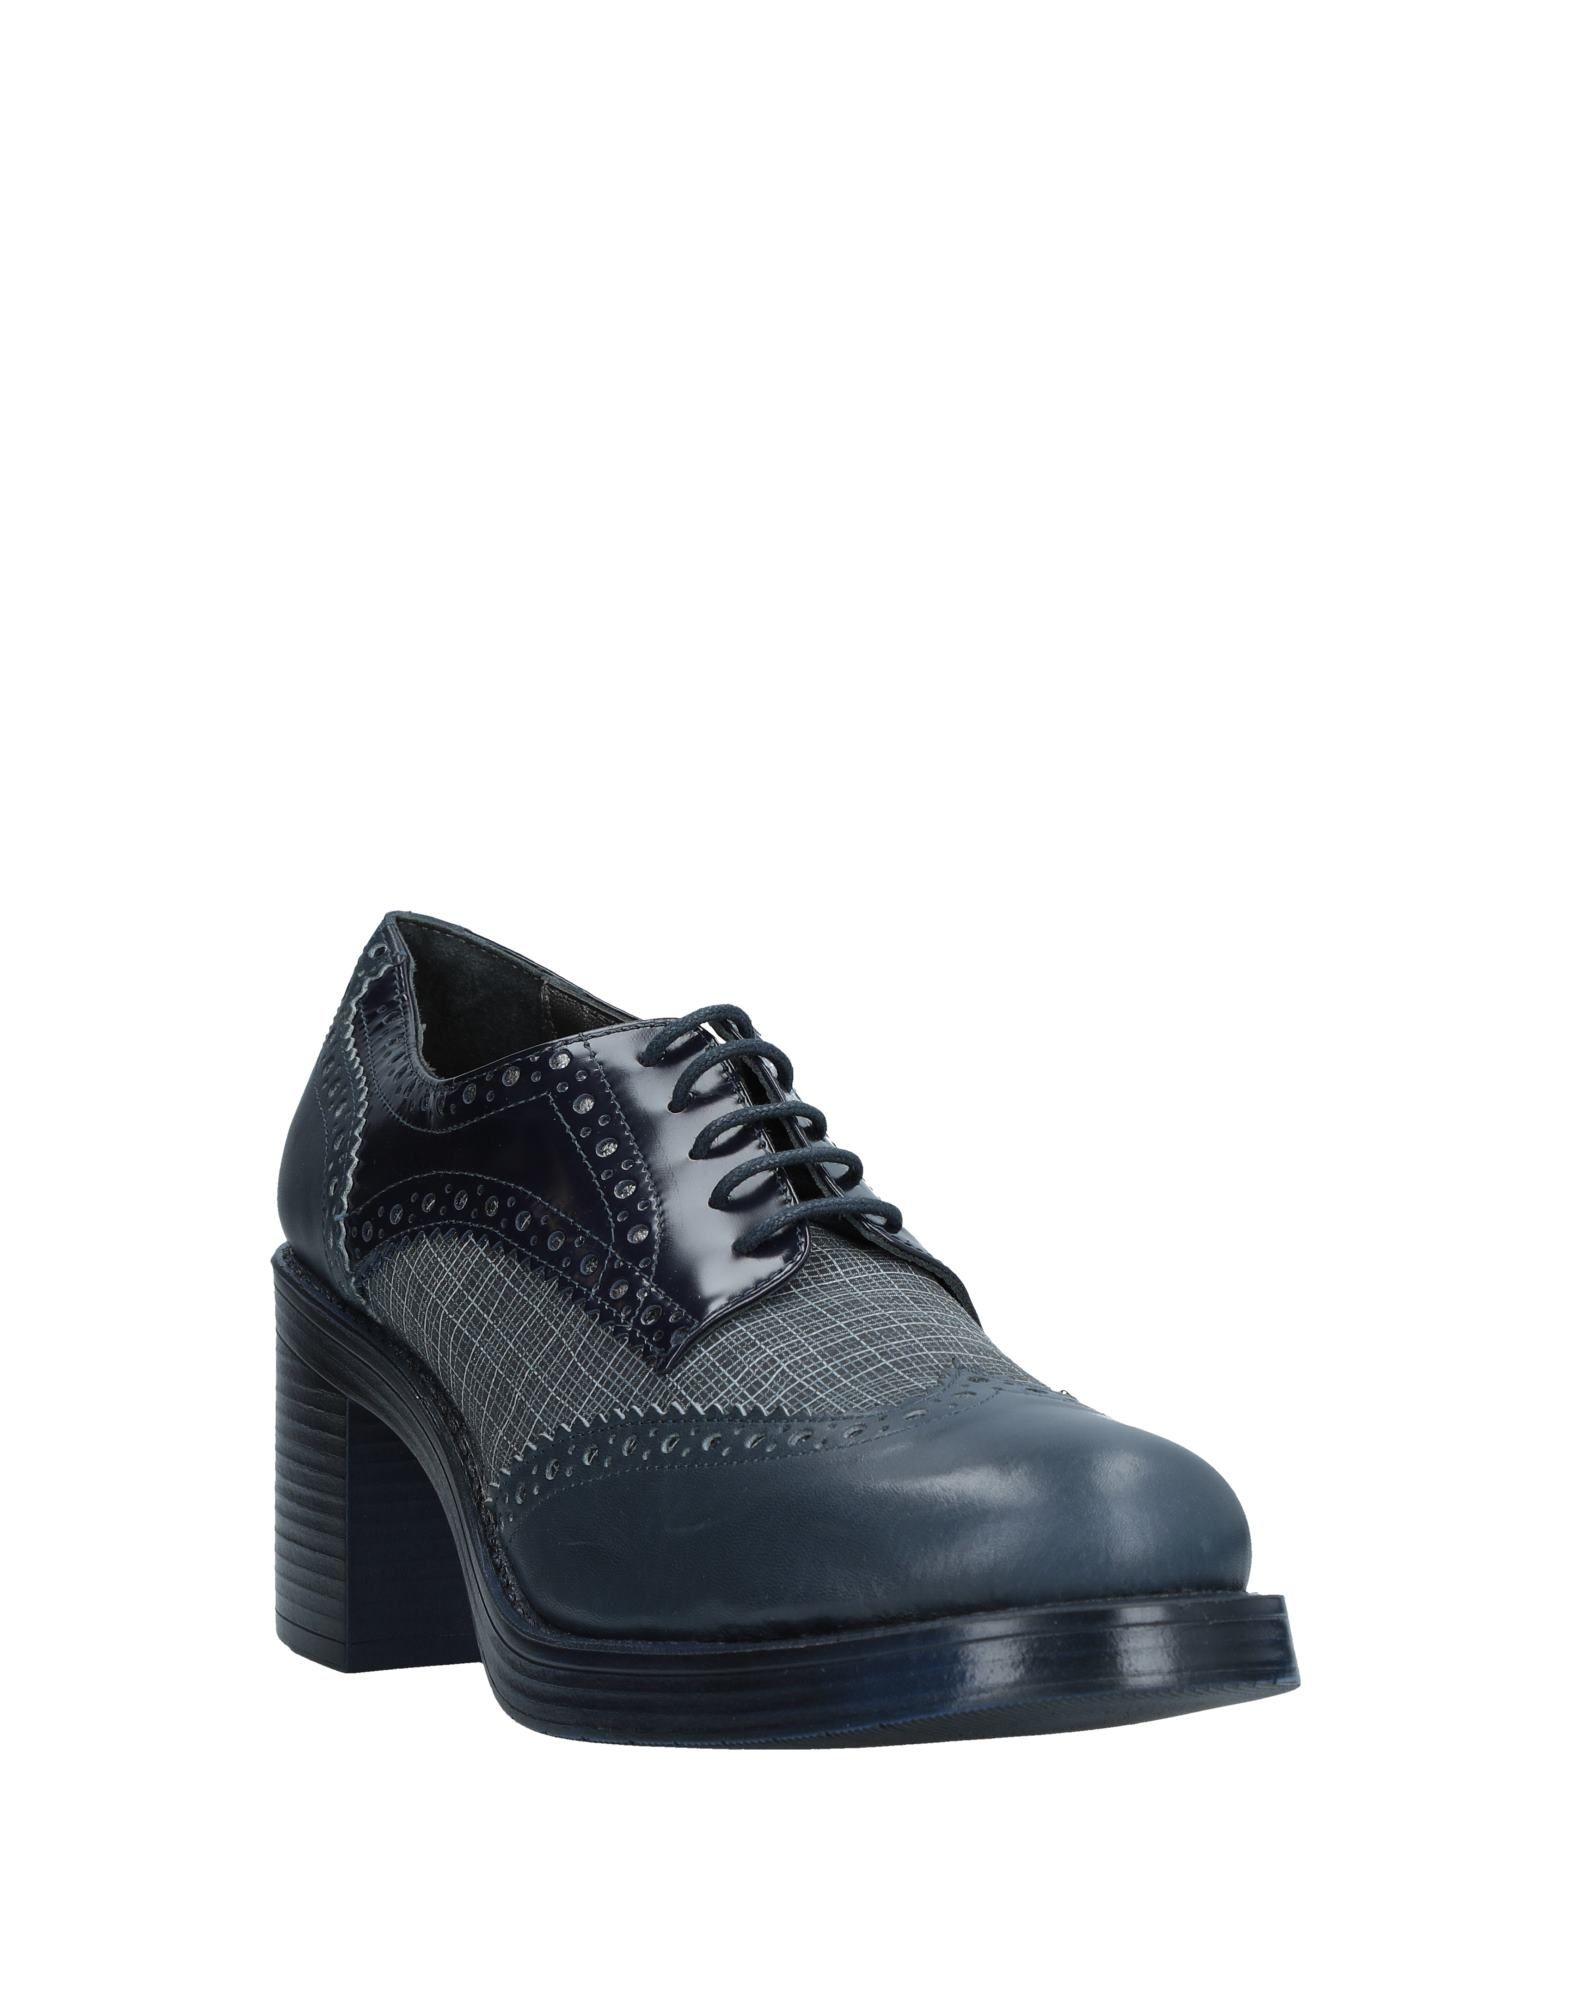 Gut um billige Schuhe zu 11537785JM tragenEbarrito Schnürschuhe Damen  11537785JM zu 4dce7b